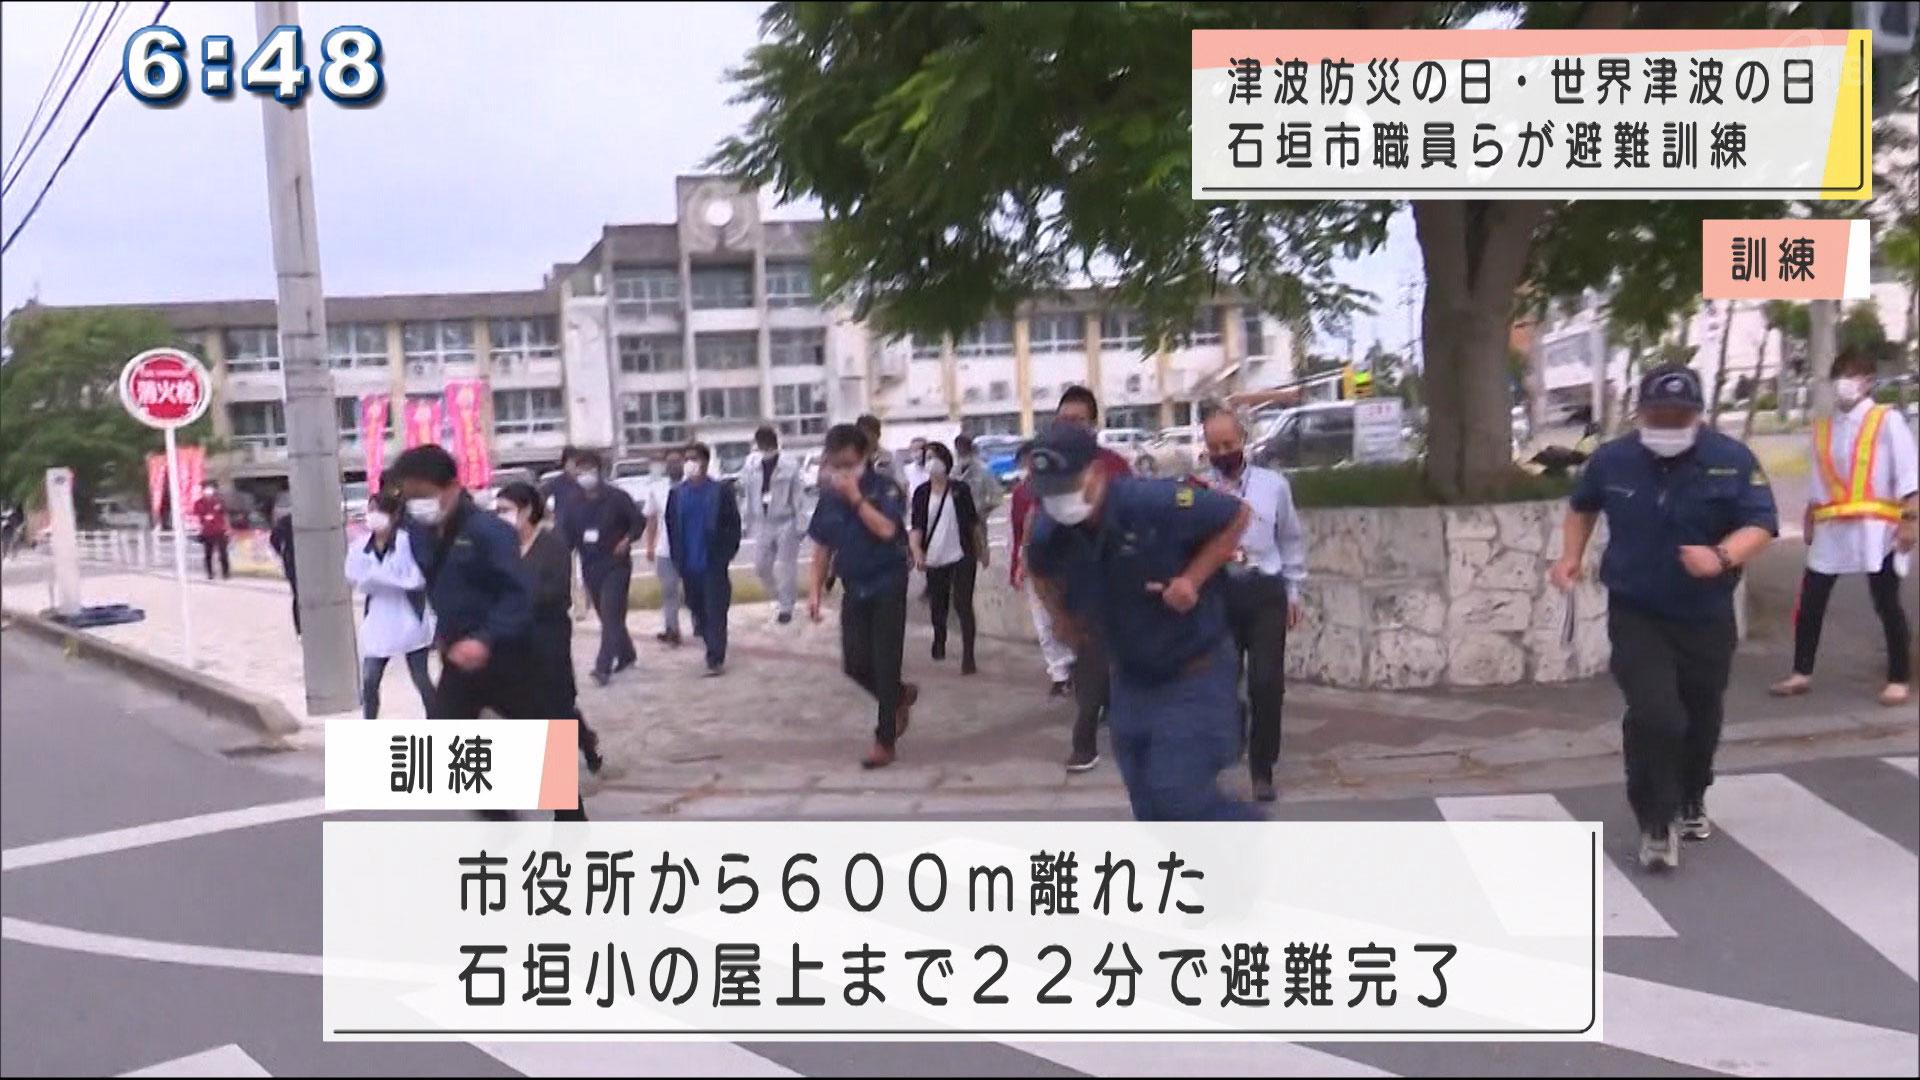 「津波防災の日」石垣市で避難訓練